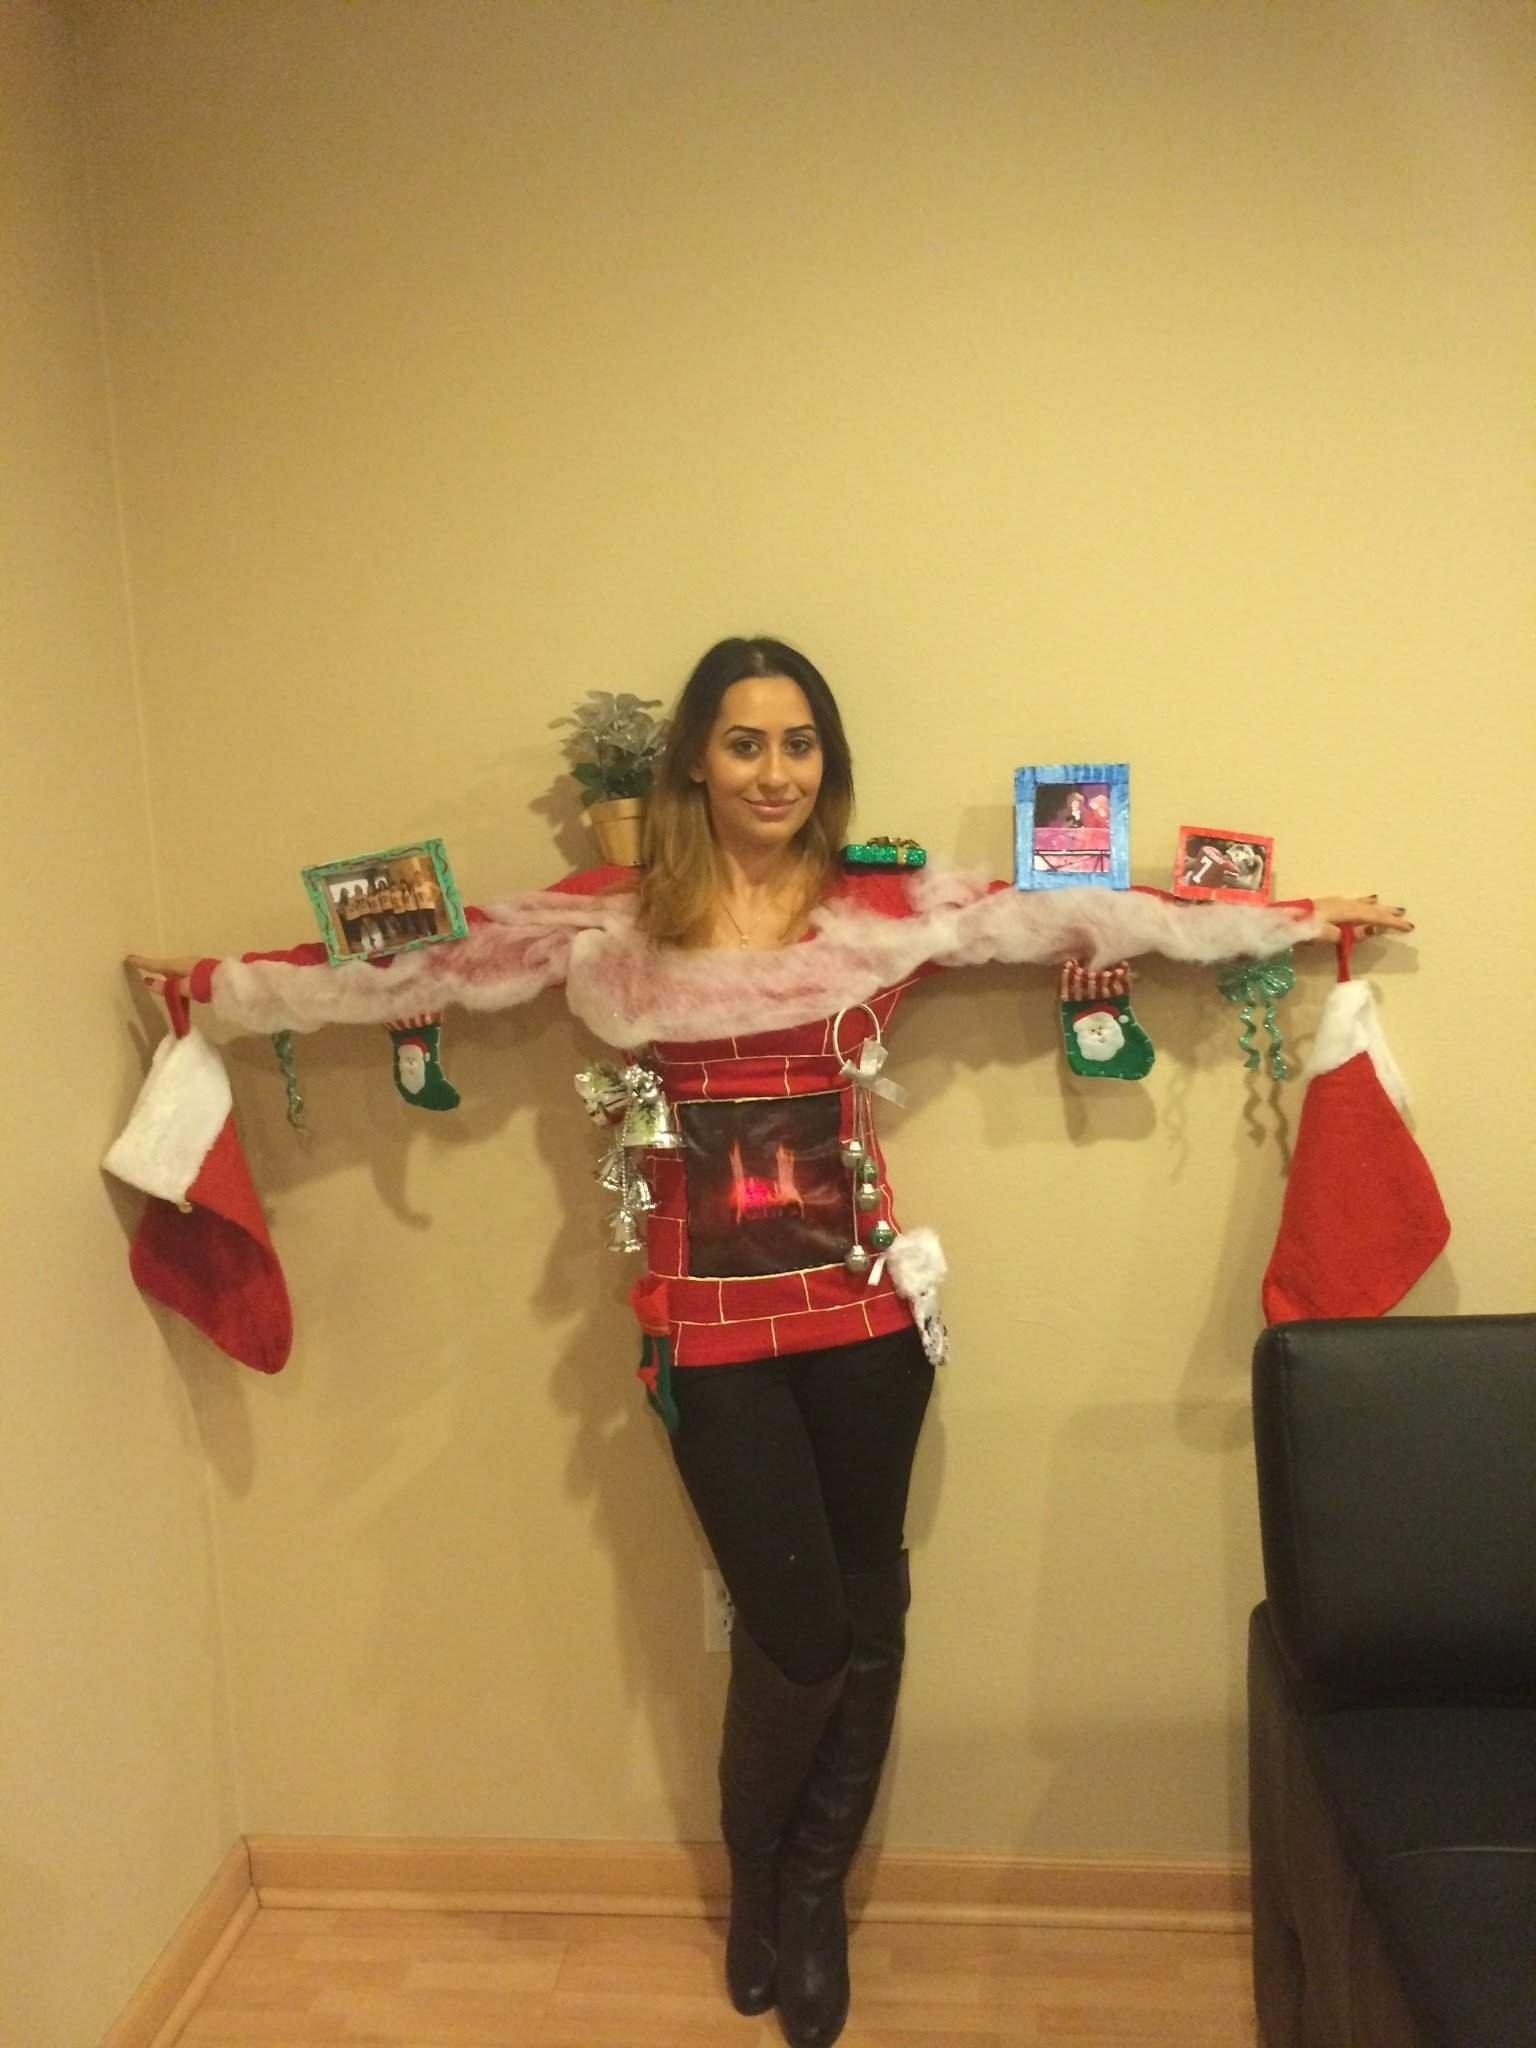 10 Stylish Ugly Christmas Sweaters Ideas Homemade diy ugly christmas sweaters sweater ideas idolza 1 2021